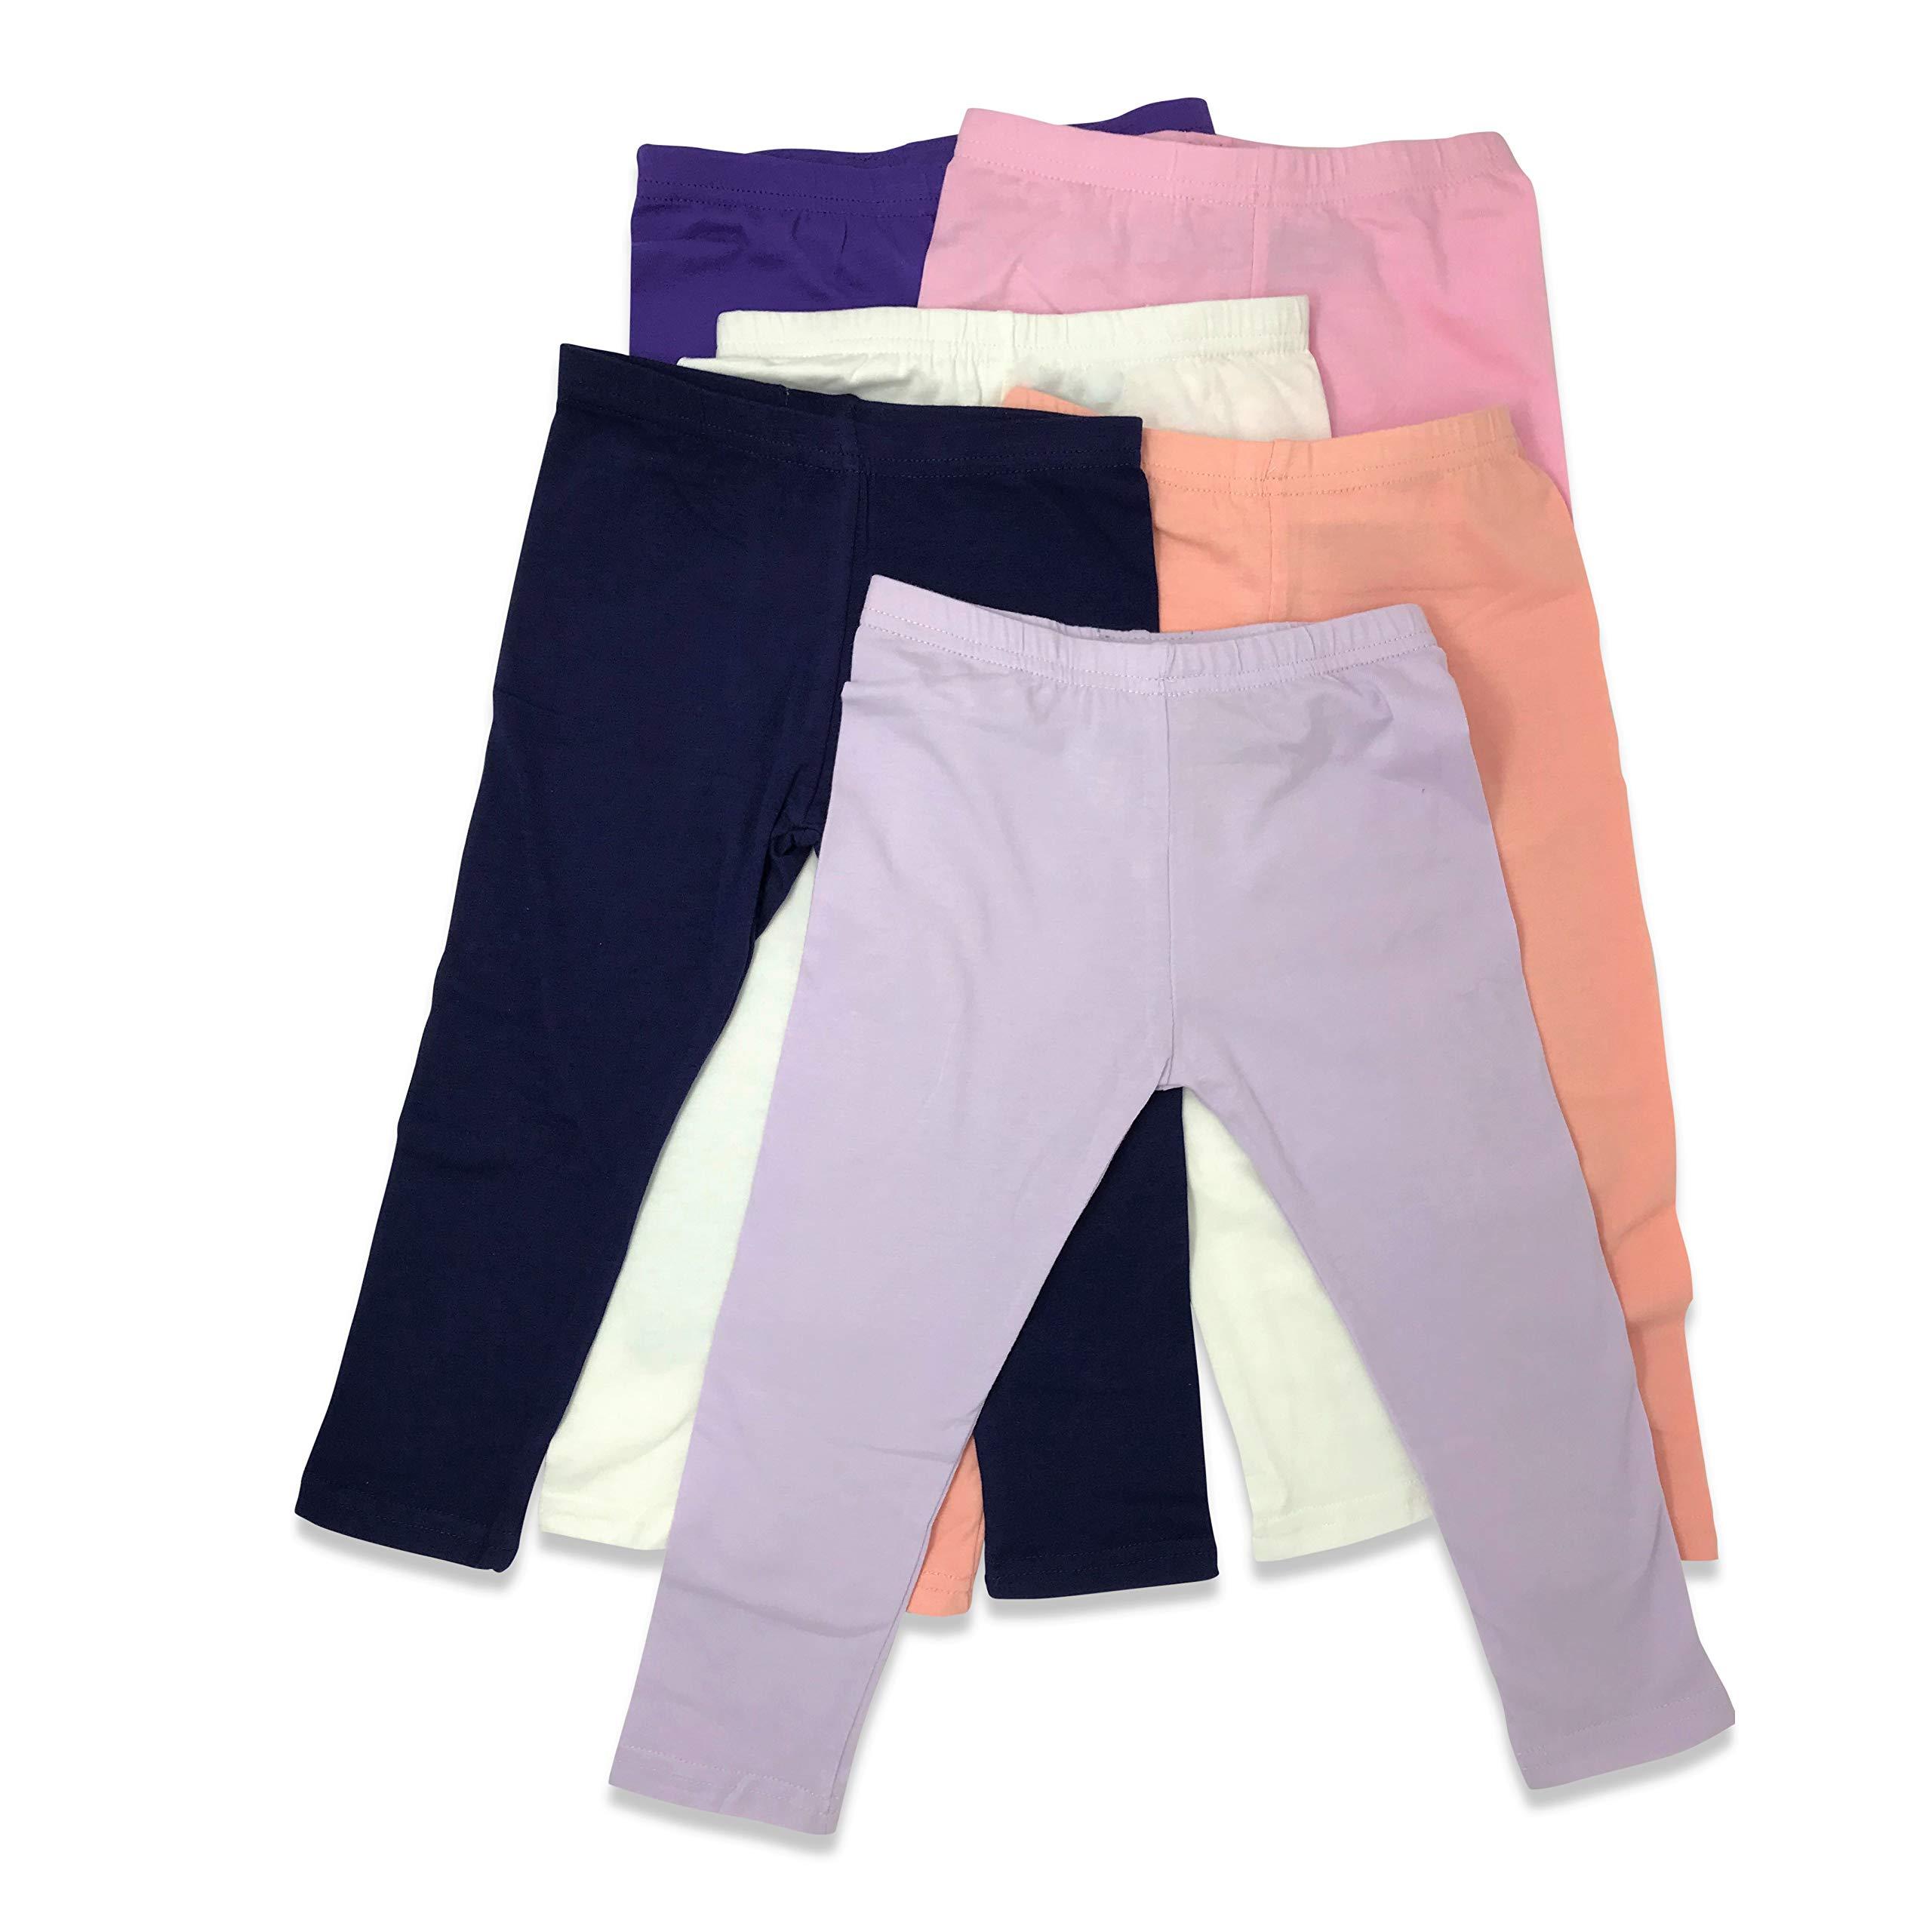 Boys Girls Toddler Little Kids Unisex 6 Pack Cotton Stretch Snug Fitting Long Pant Leggings (6 Pack- Pastels, 4T)